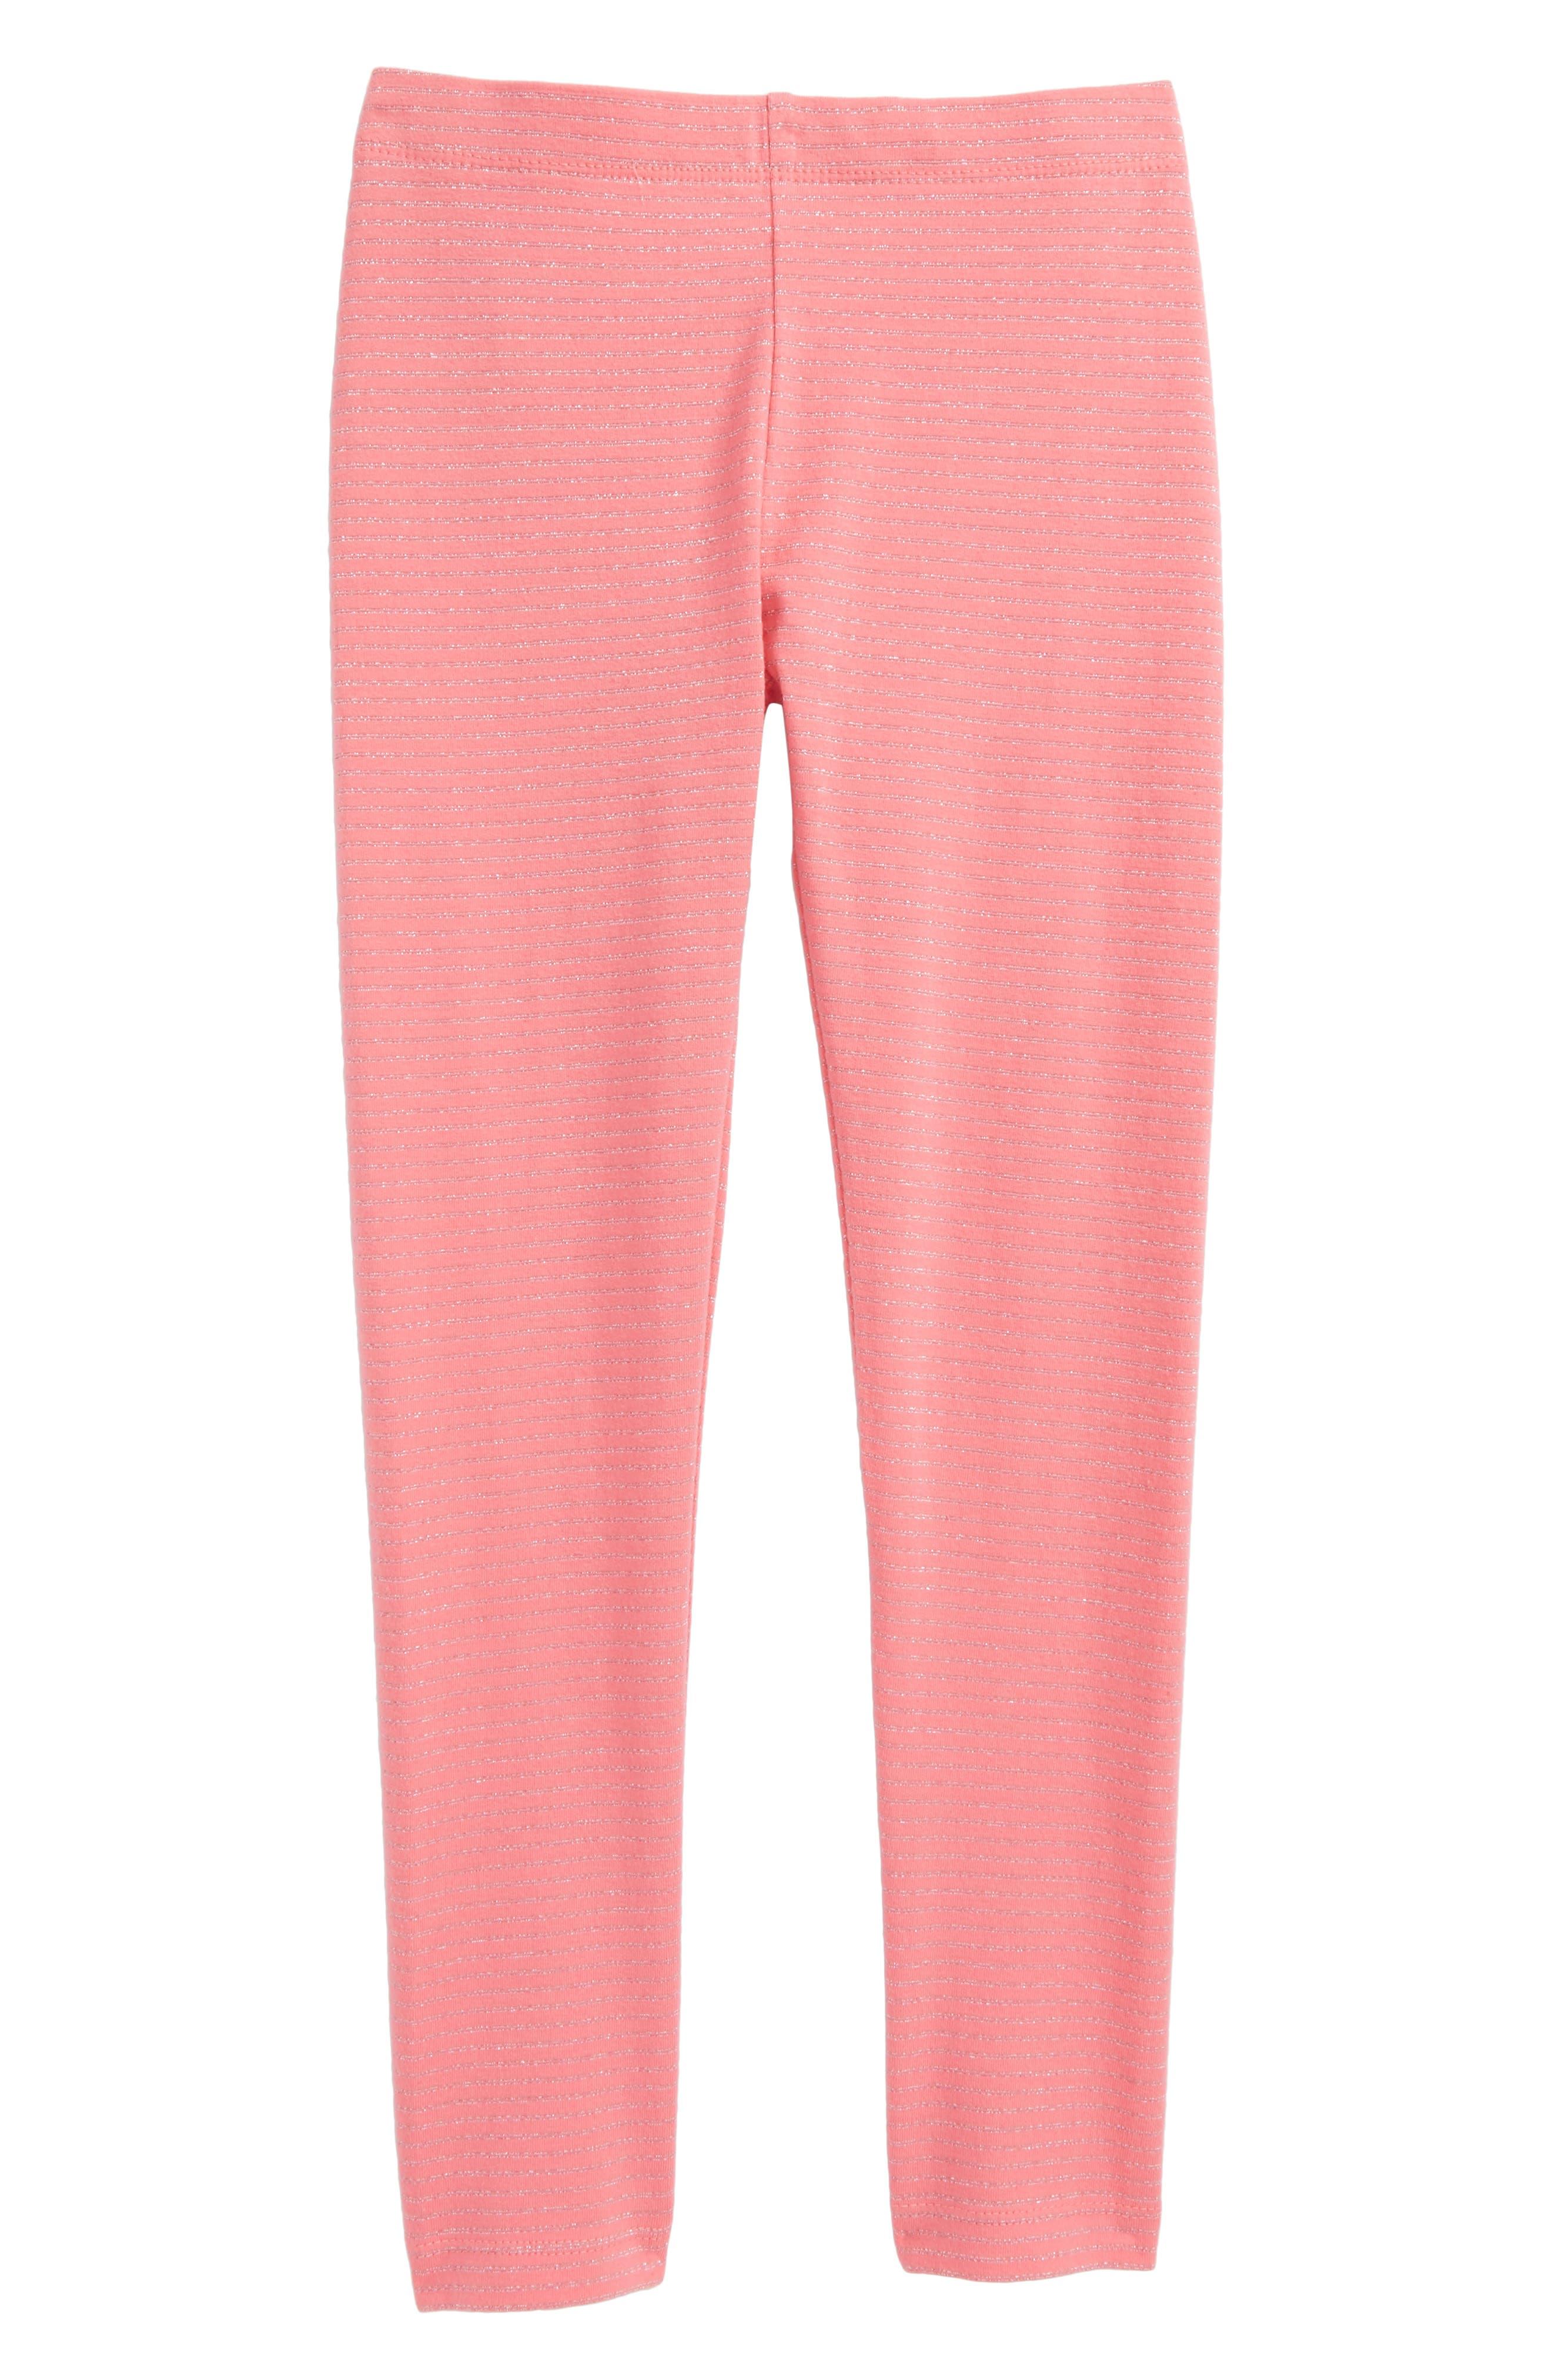 Sparkle Stripe Leggings,                         Main,                         color, Pink Lemonade Sparkle Stripe